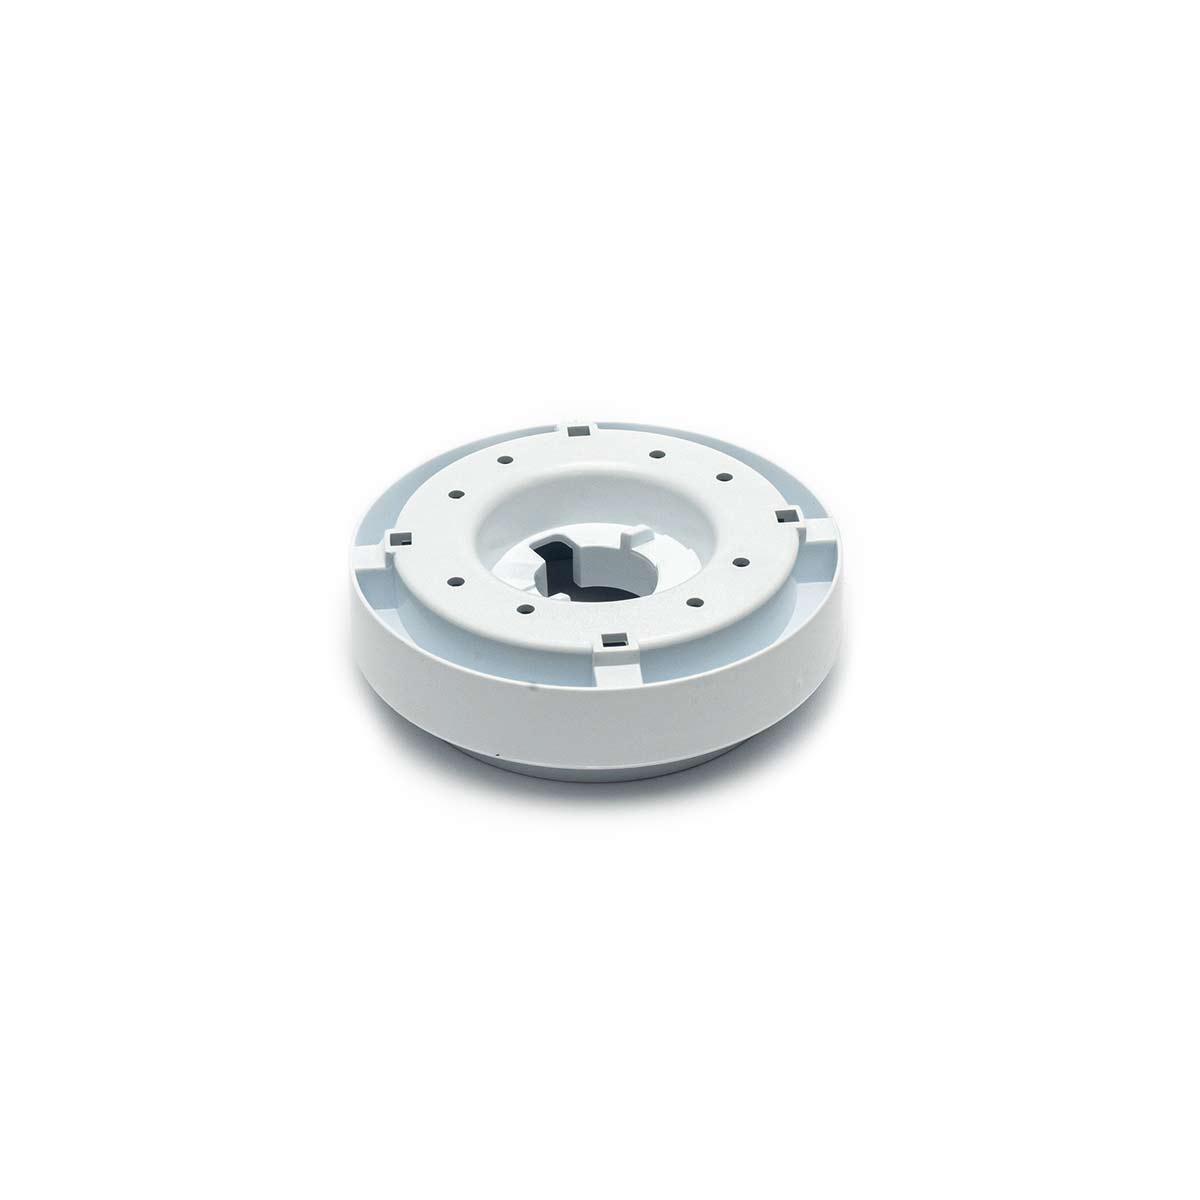 Suporte da tampa para o filtro da Lavadora Automática Colormaq 12kg e 15kg {{add_nome}}